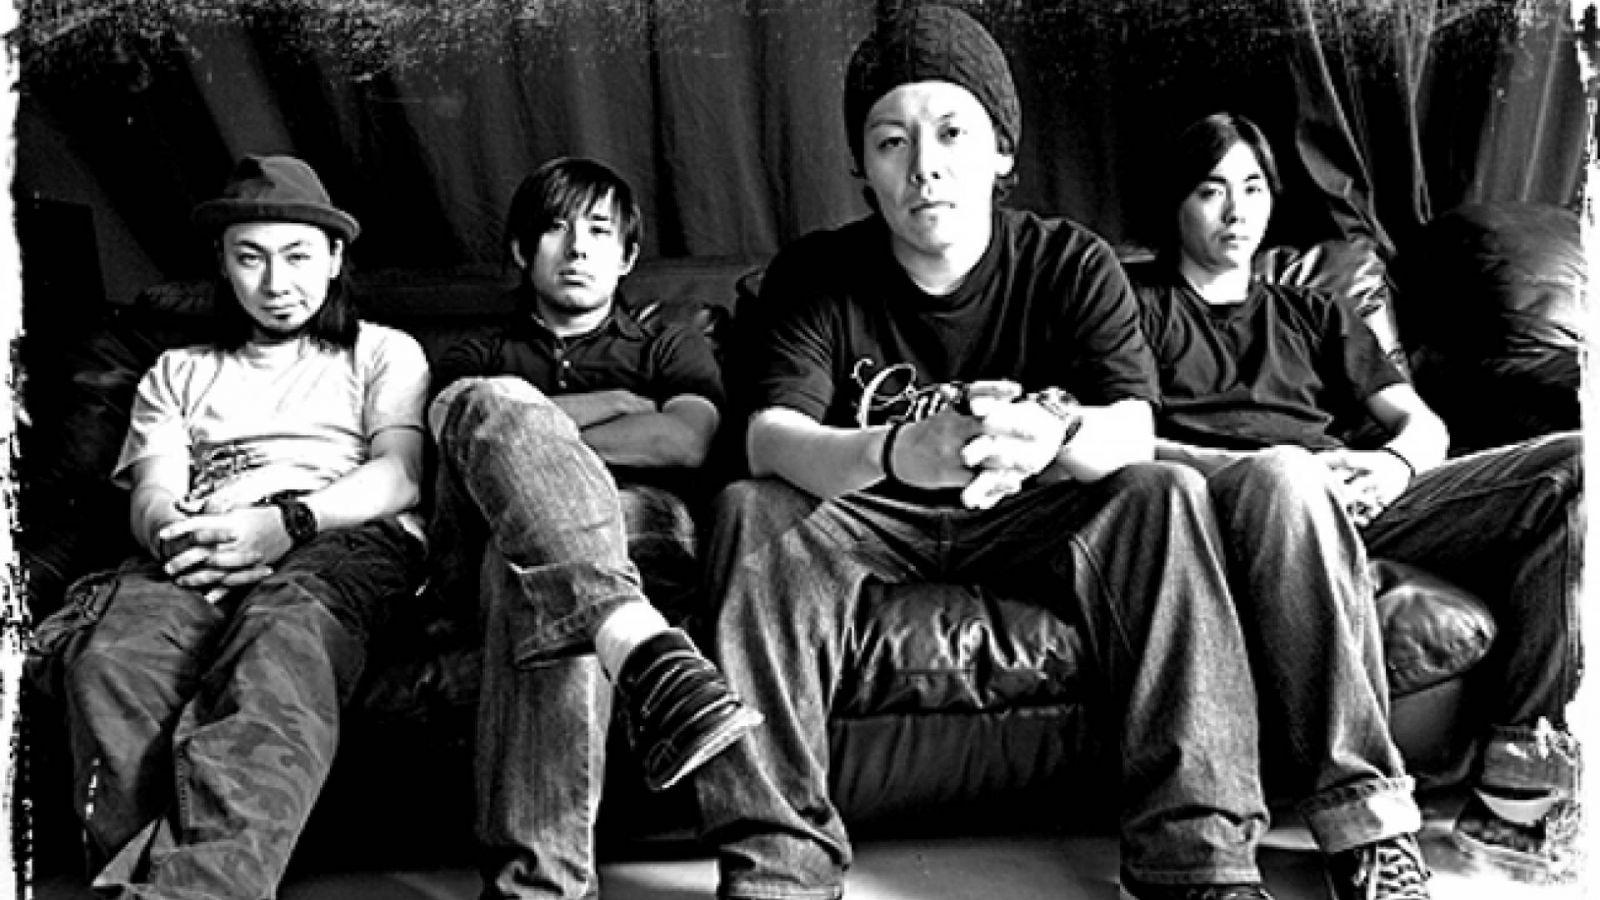 MYPROOF © Higashi Music - MYPROOF